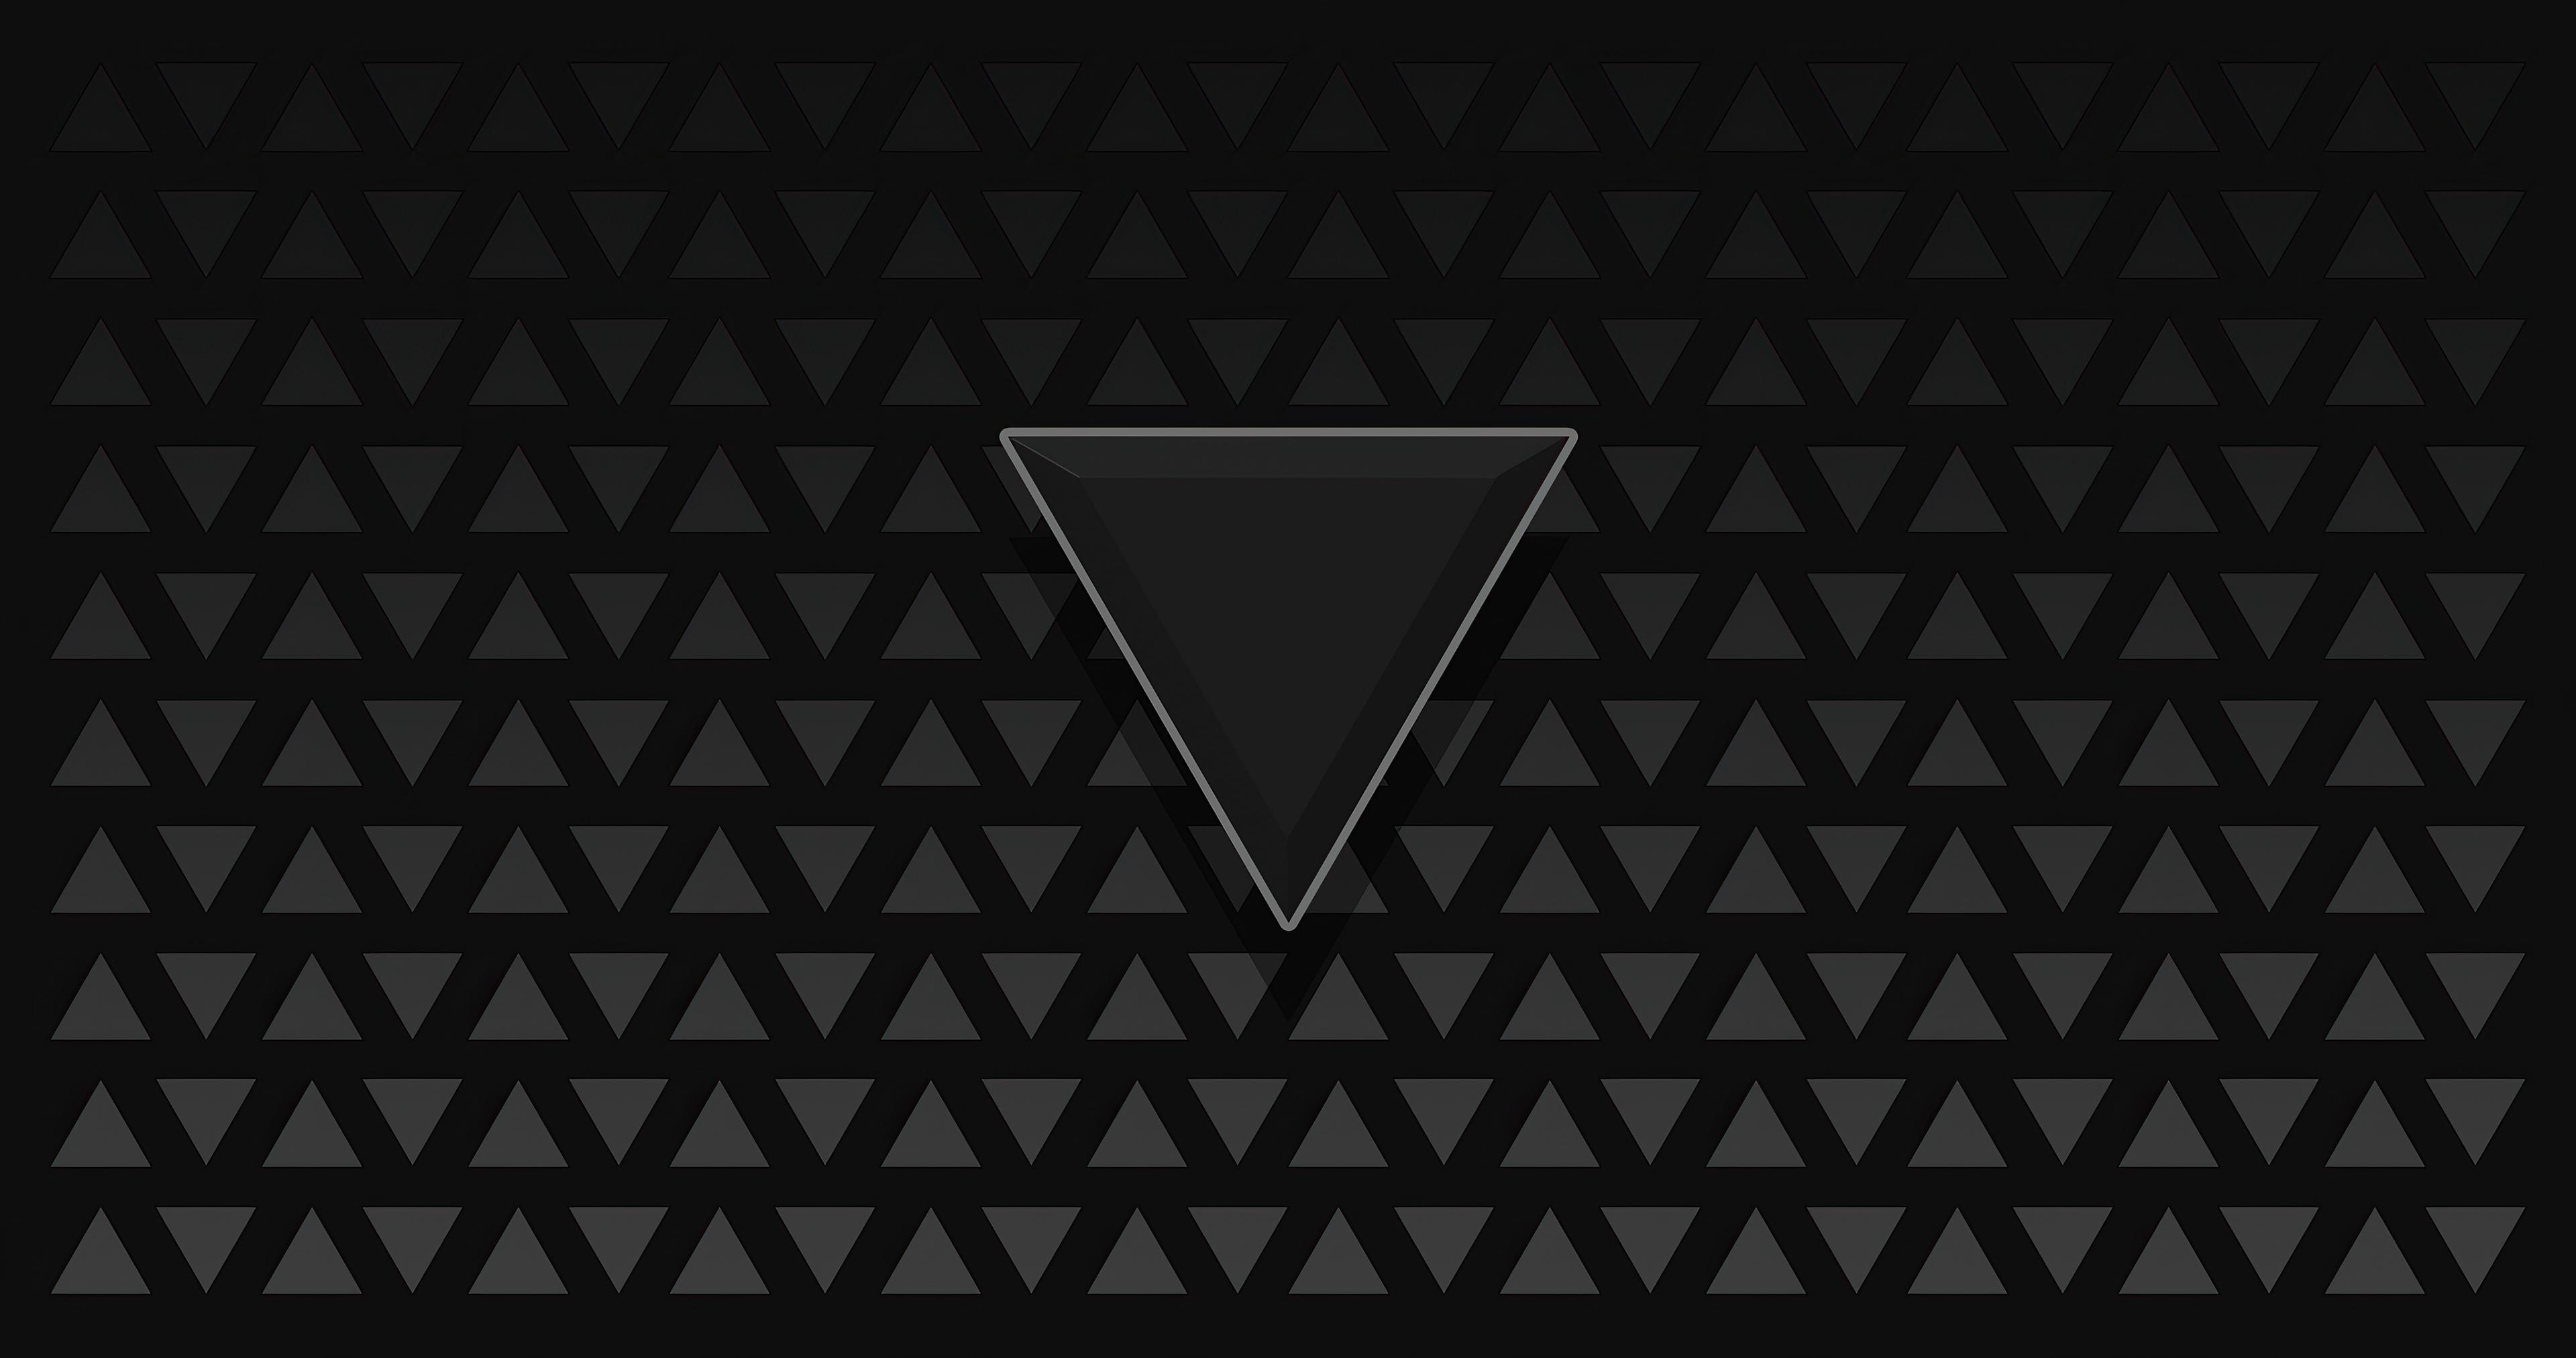 triangle dark black 4k 1602440037 - Triangle Dark Black 4k - Triangle Dark Black 4k wallpapers